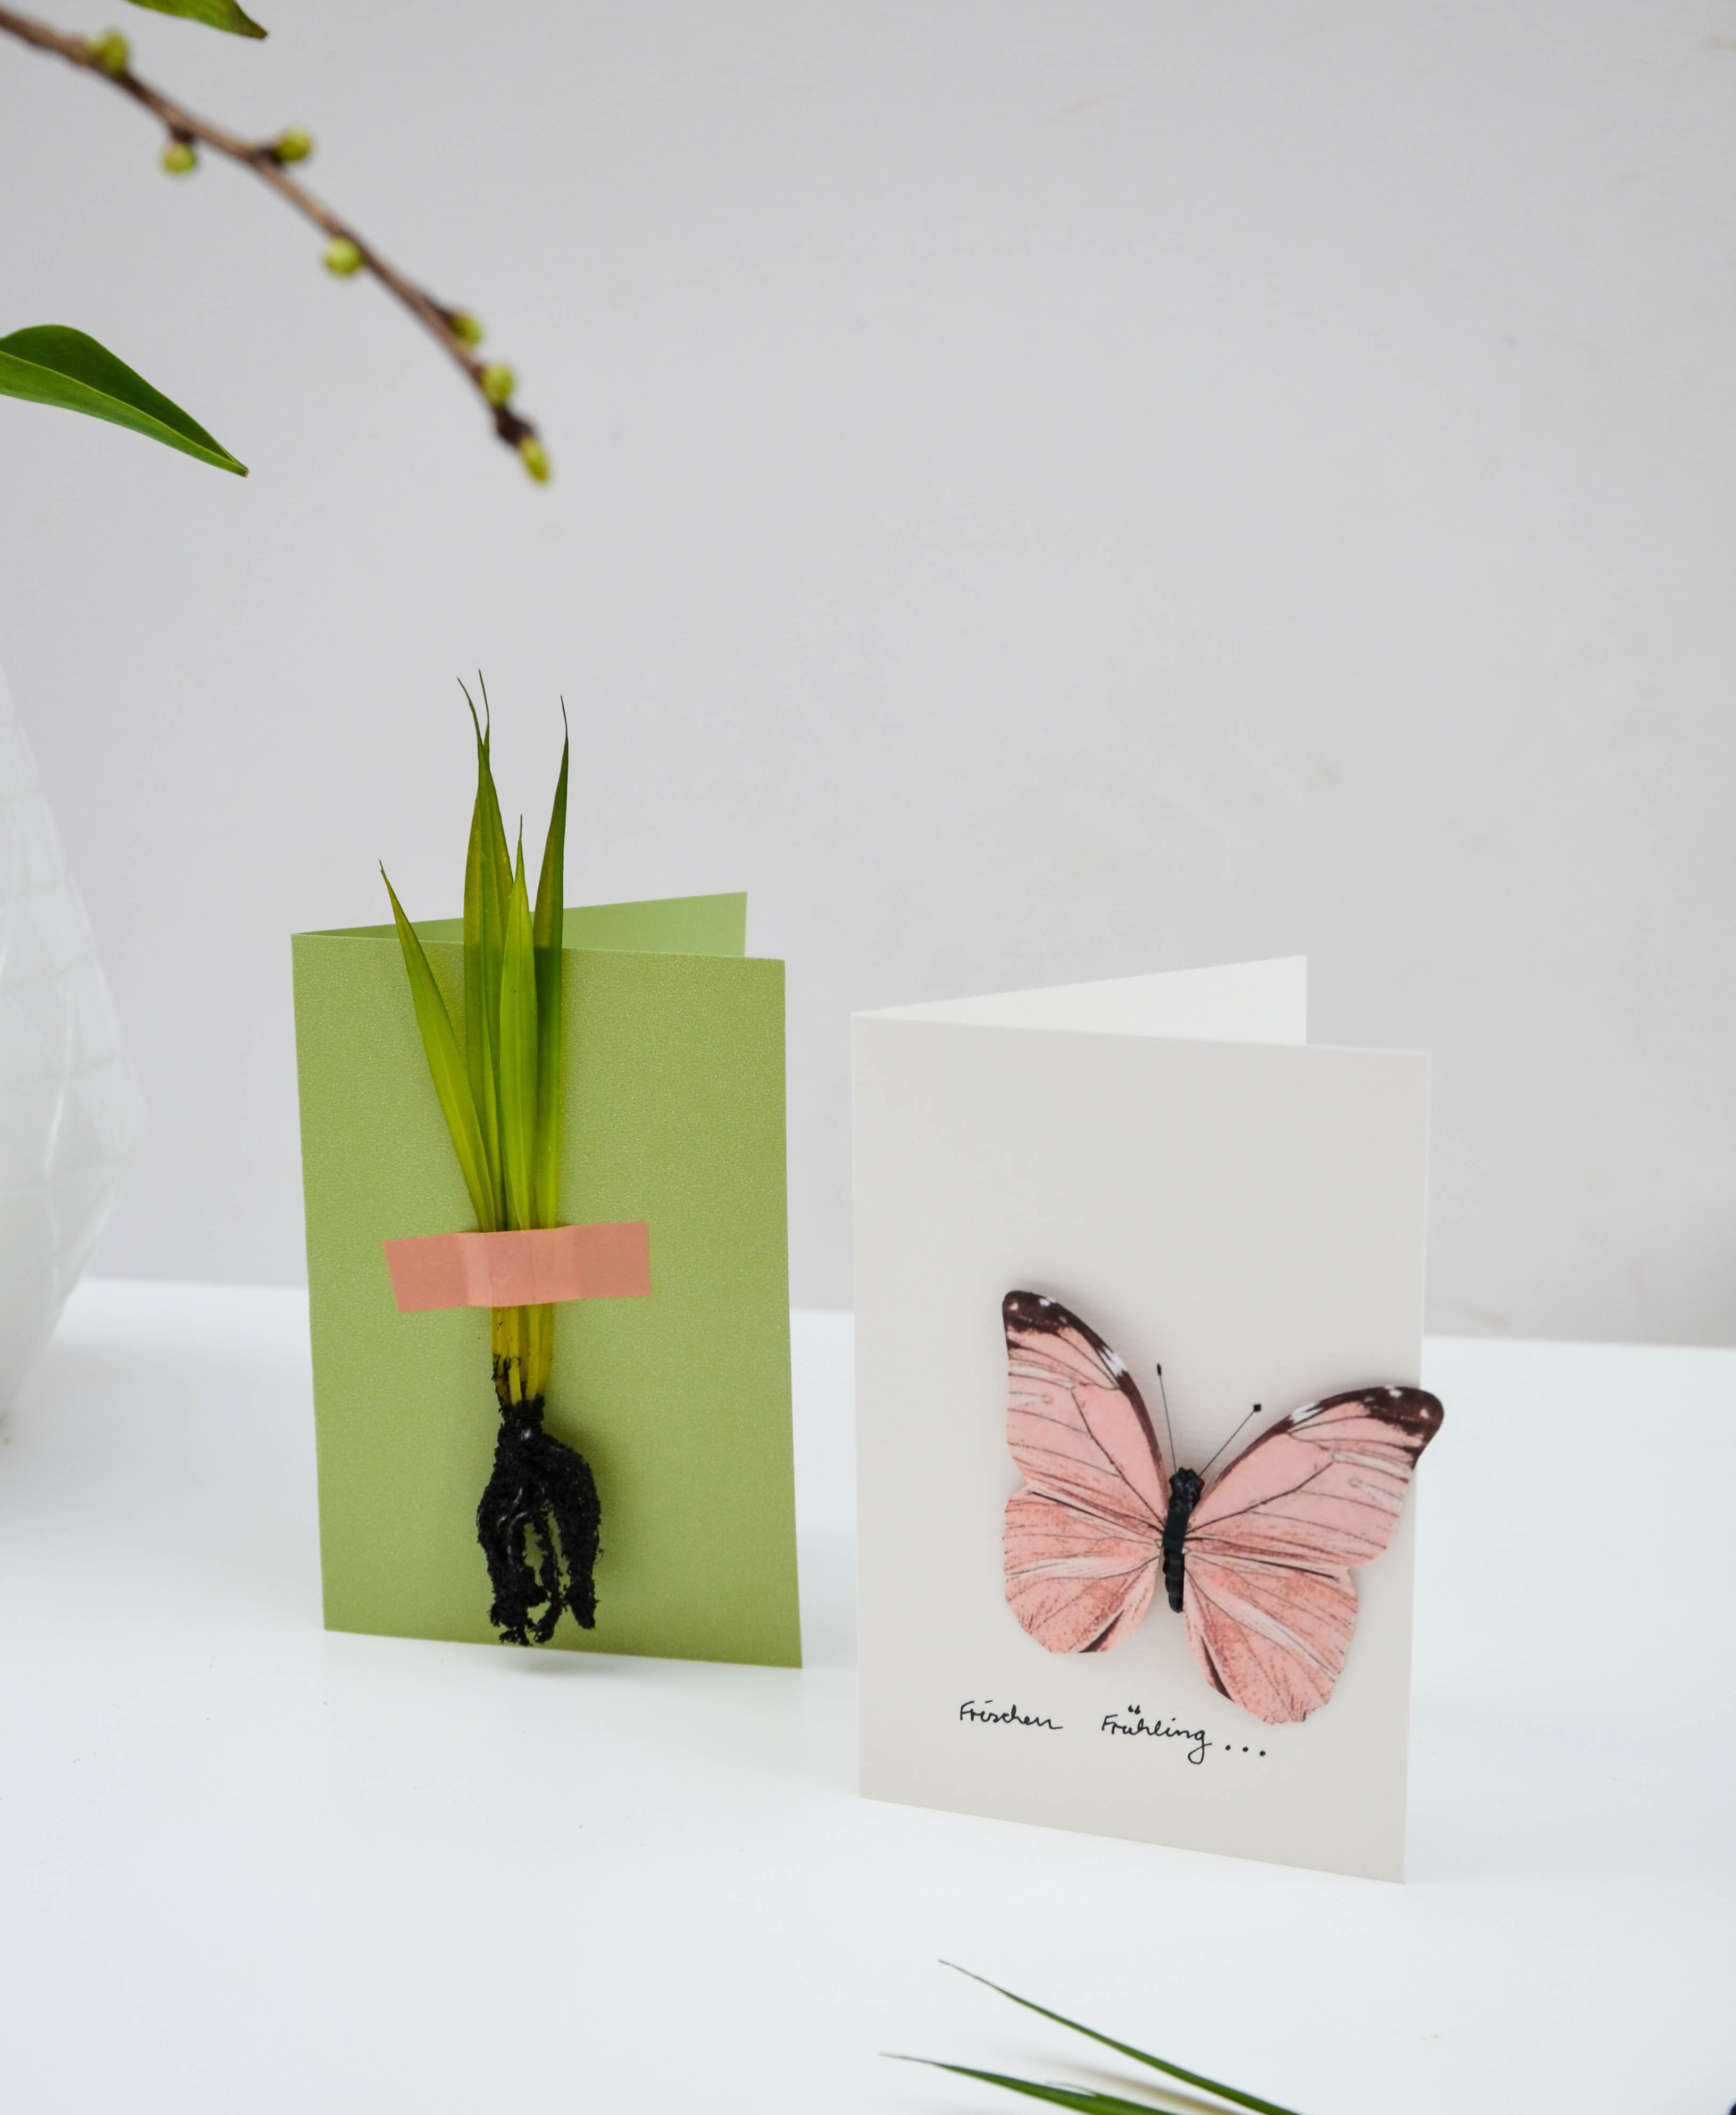 Frühling, Frühlingsgruß, Postkarte